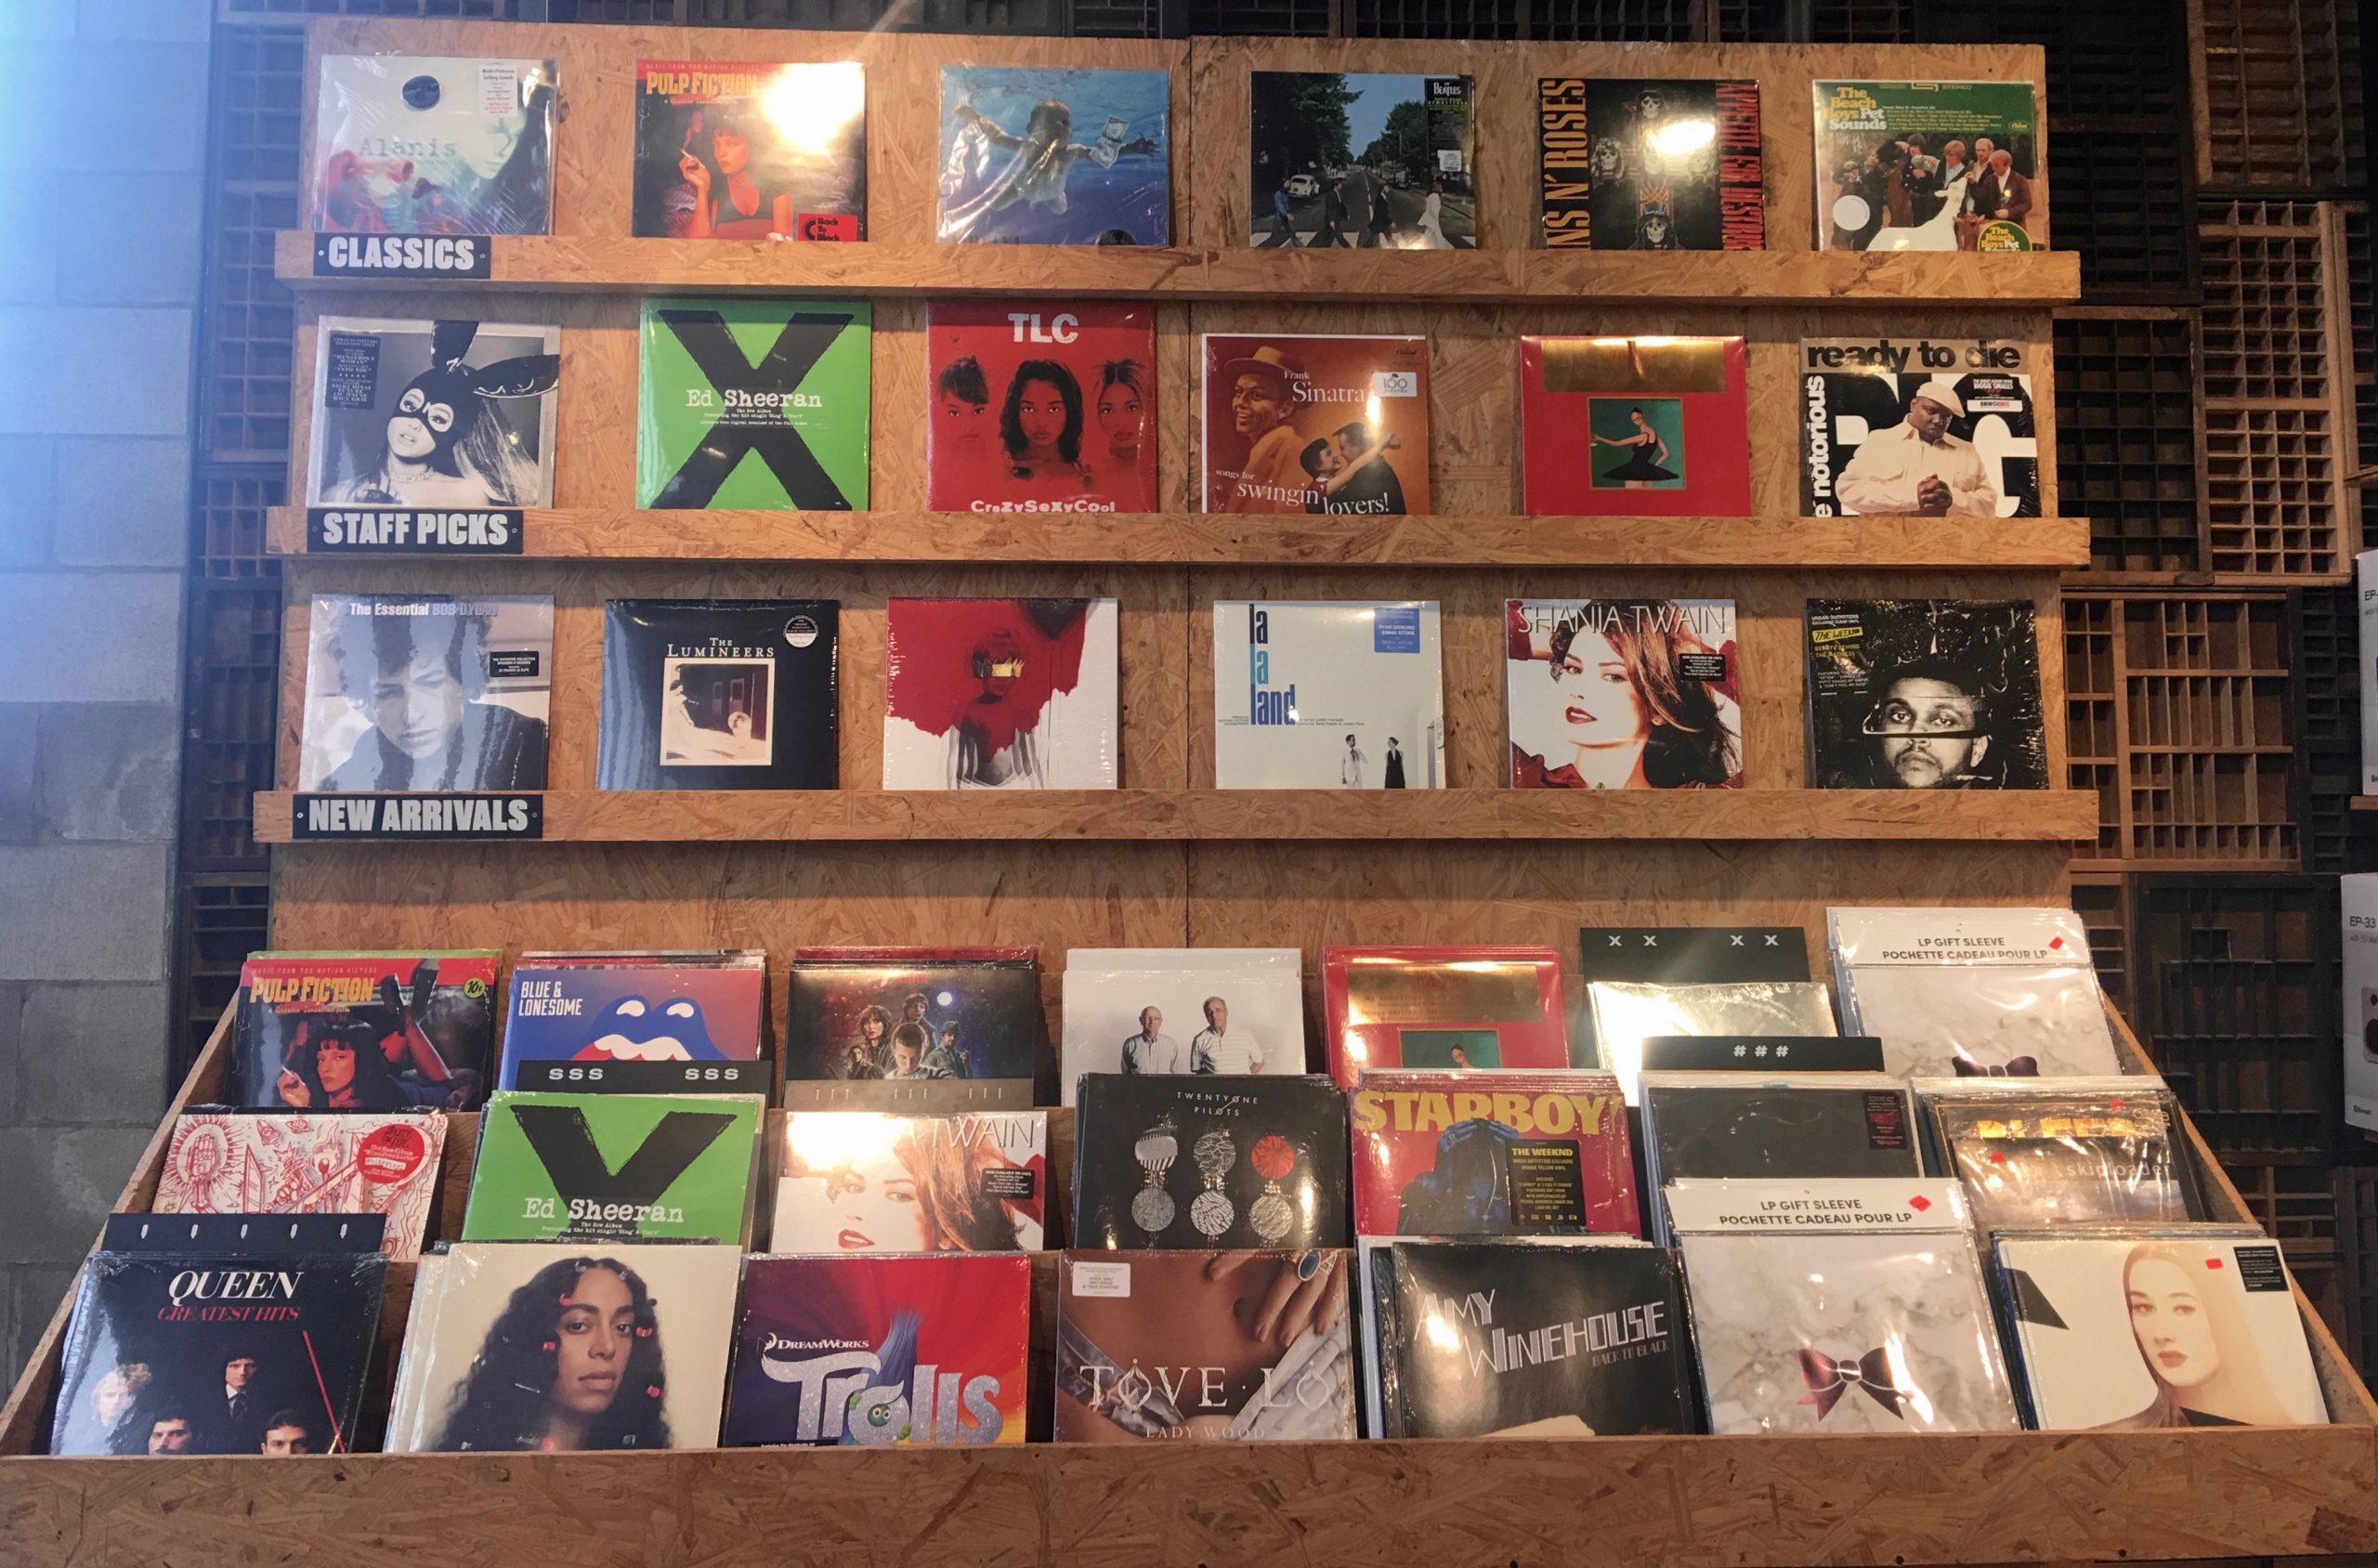 The resurrection of vinyl